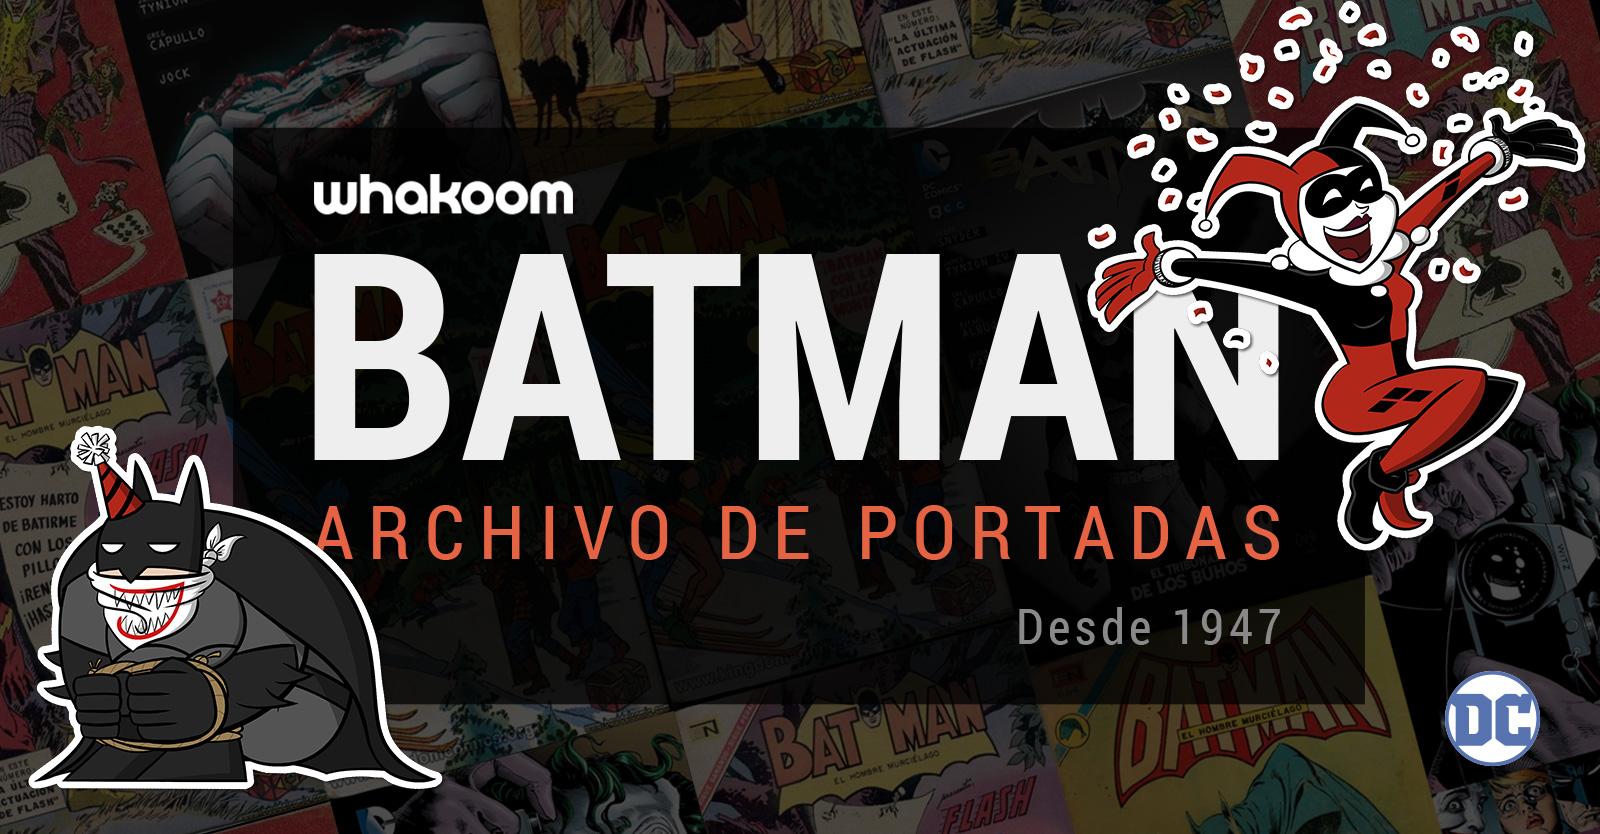 Batman Day 2017 - Whakoom presenta... ¡Batman - Archivo de portadas (desde 1947)!